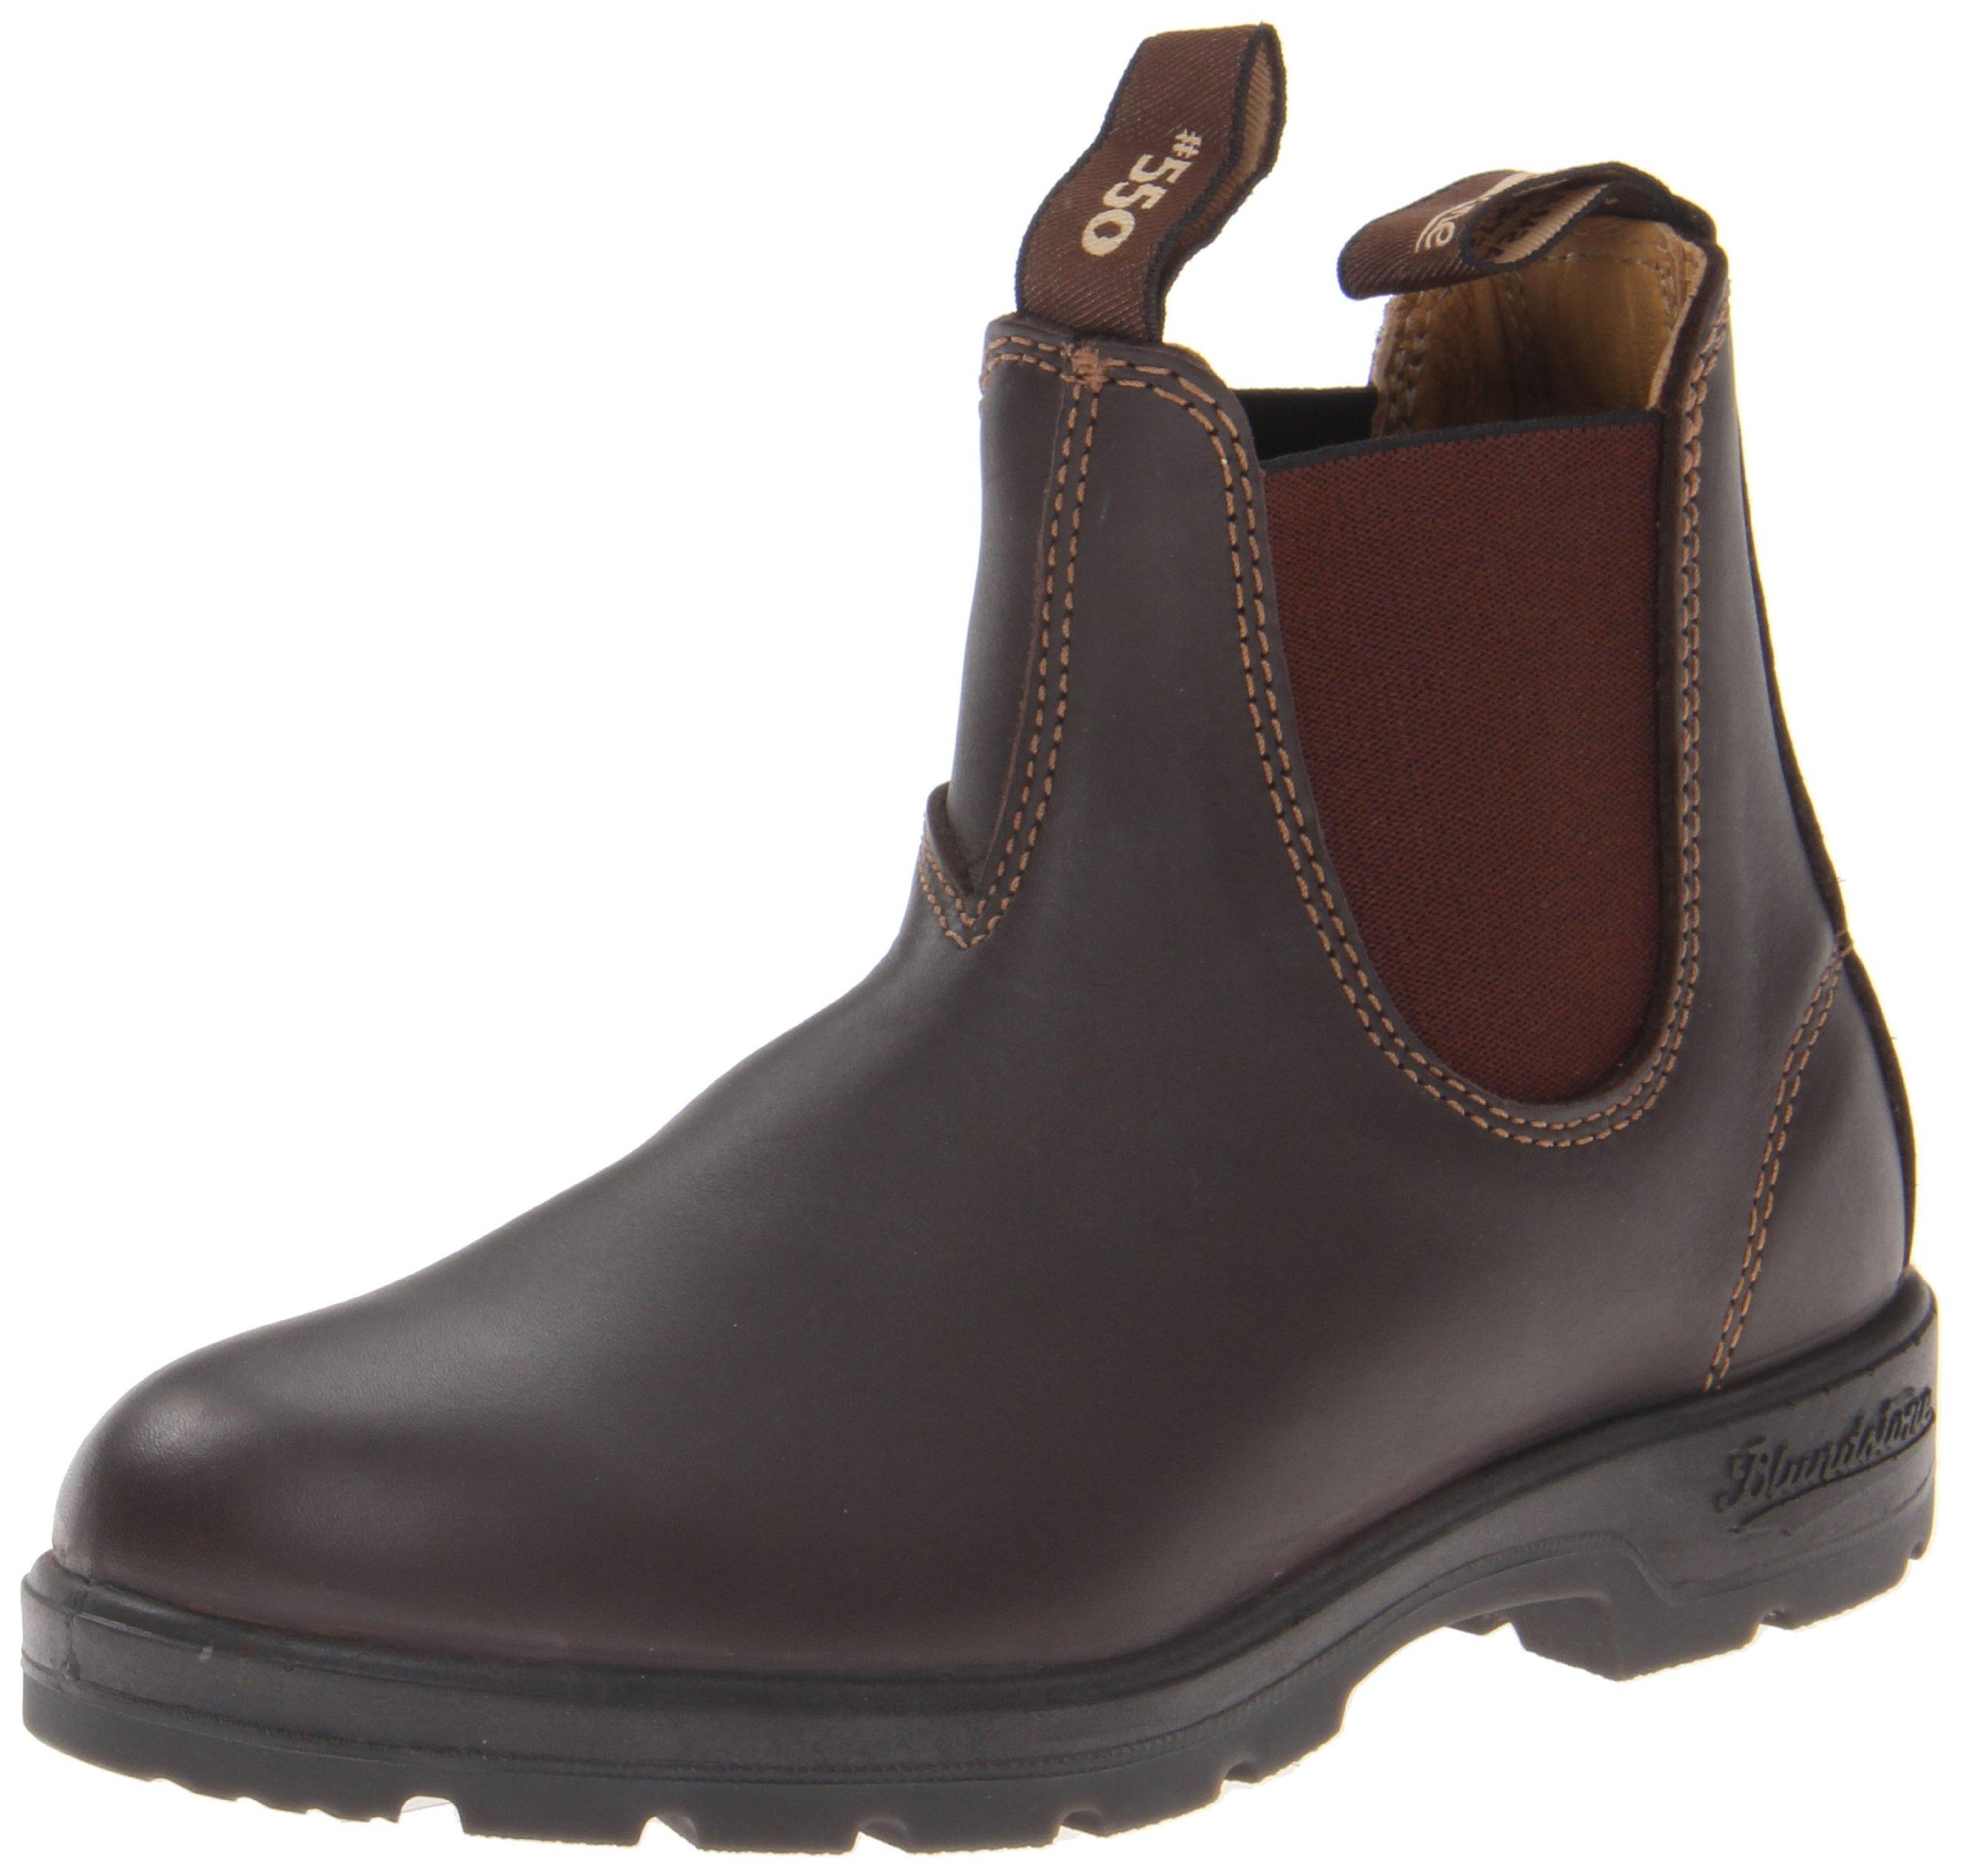 Blundstone Women's Blundstone 550 Rugged Lux Brwn Boot,Walnut,4 AU (US Women's 6.5 M)